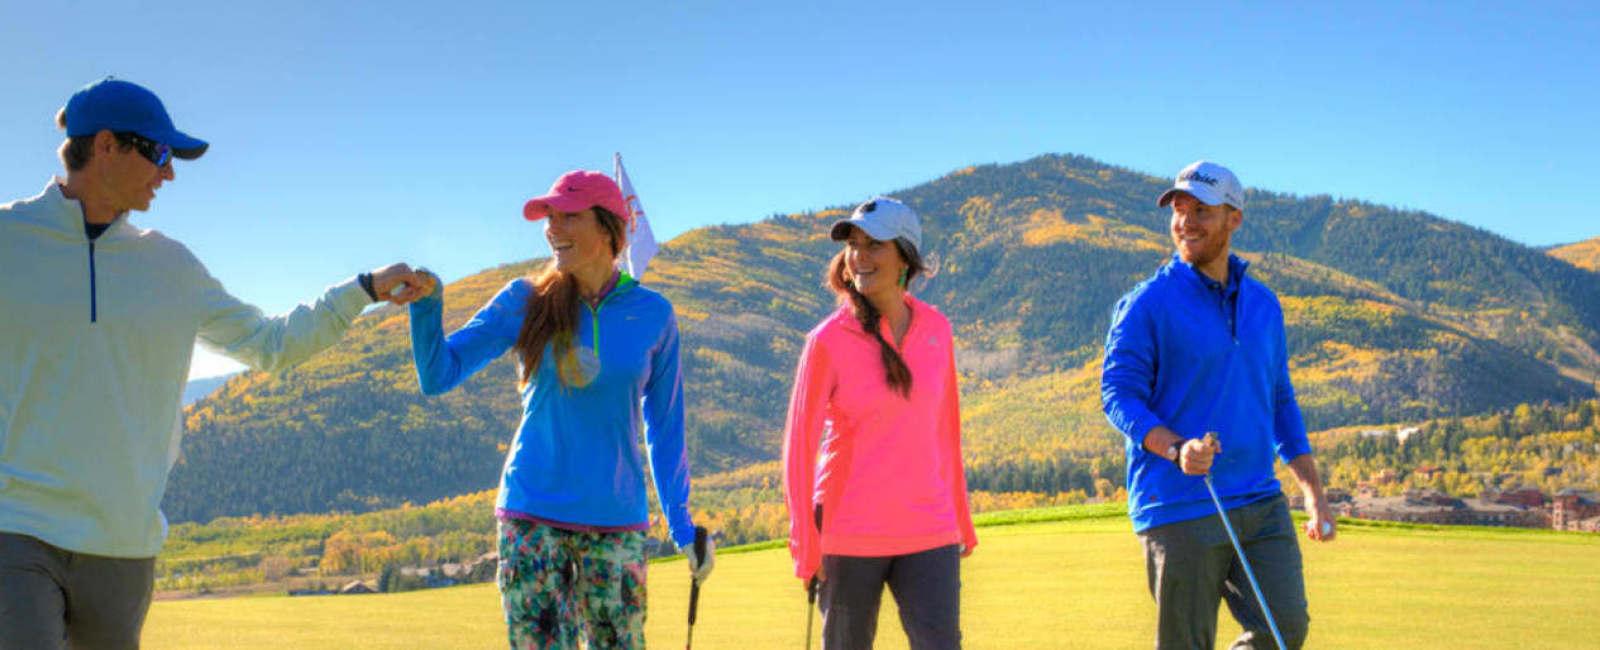 Park City Mountain Canyons Golf Course